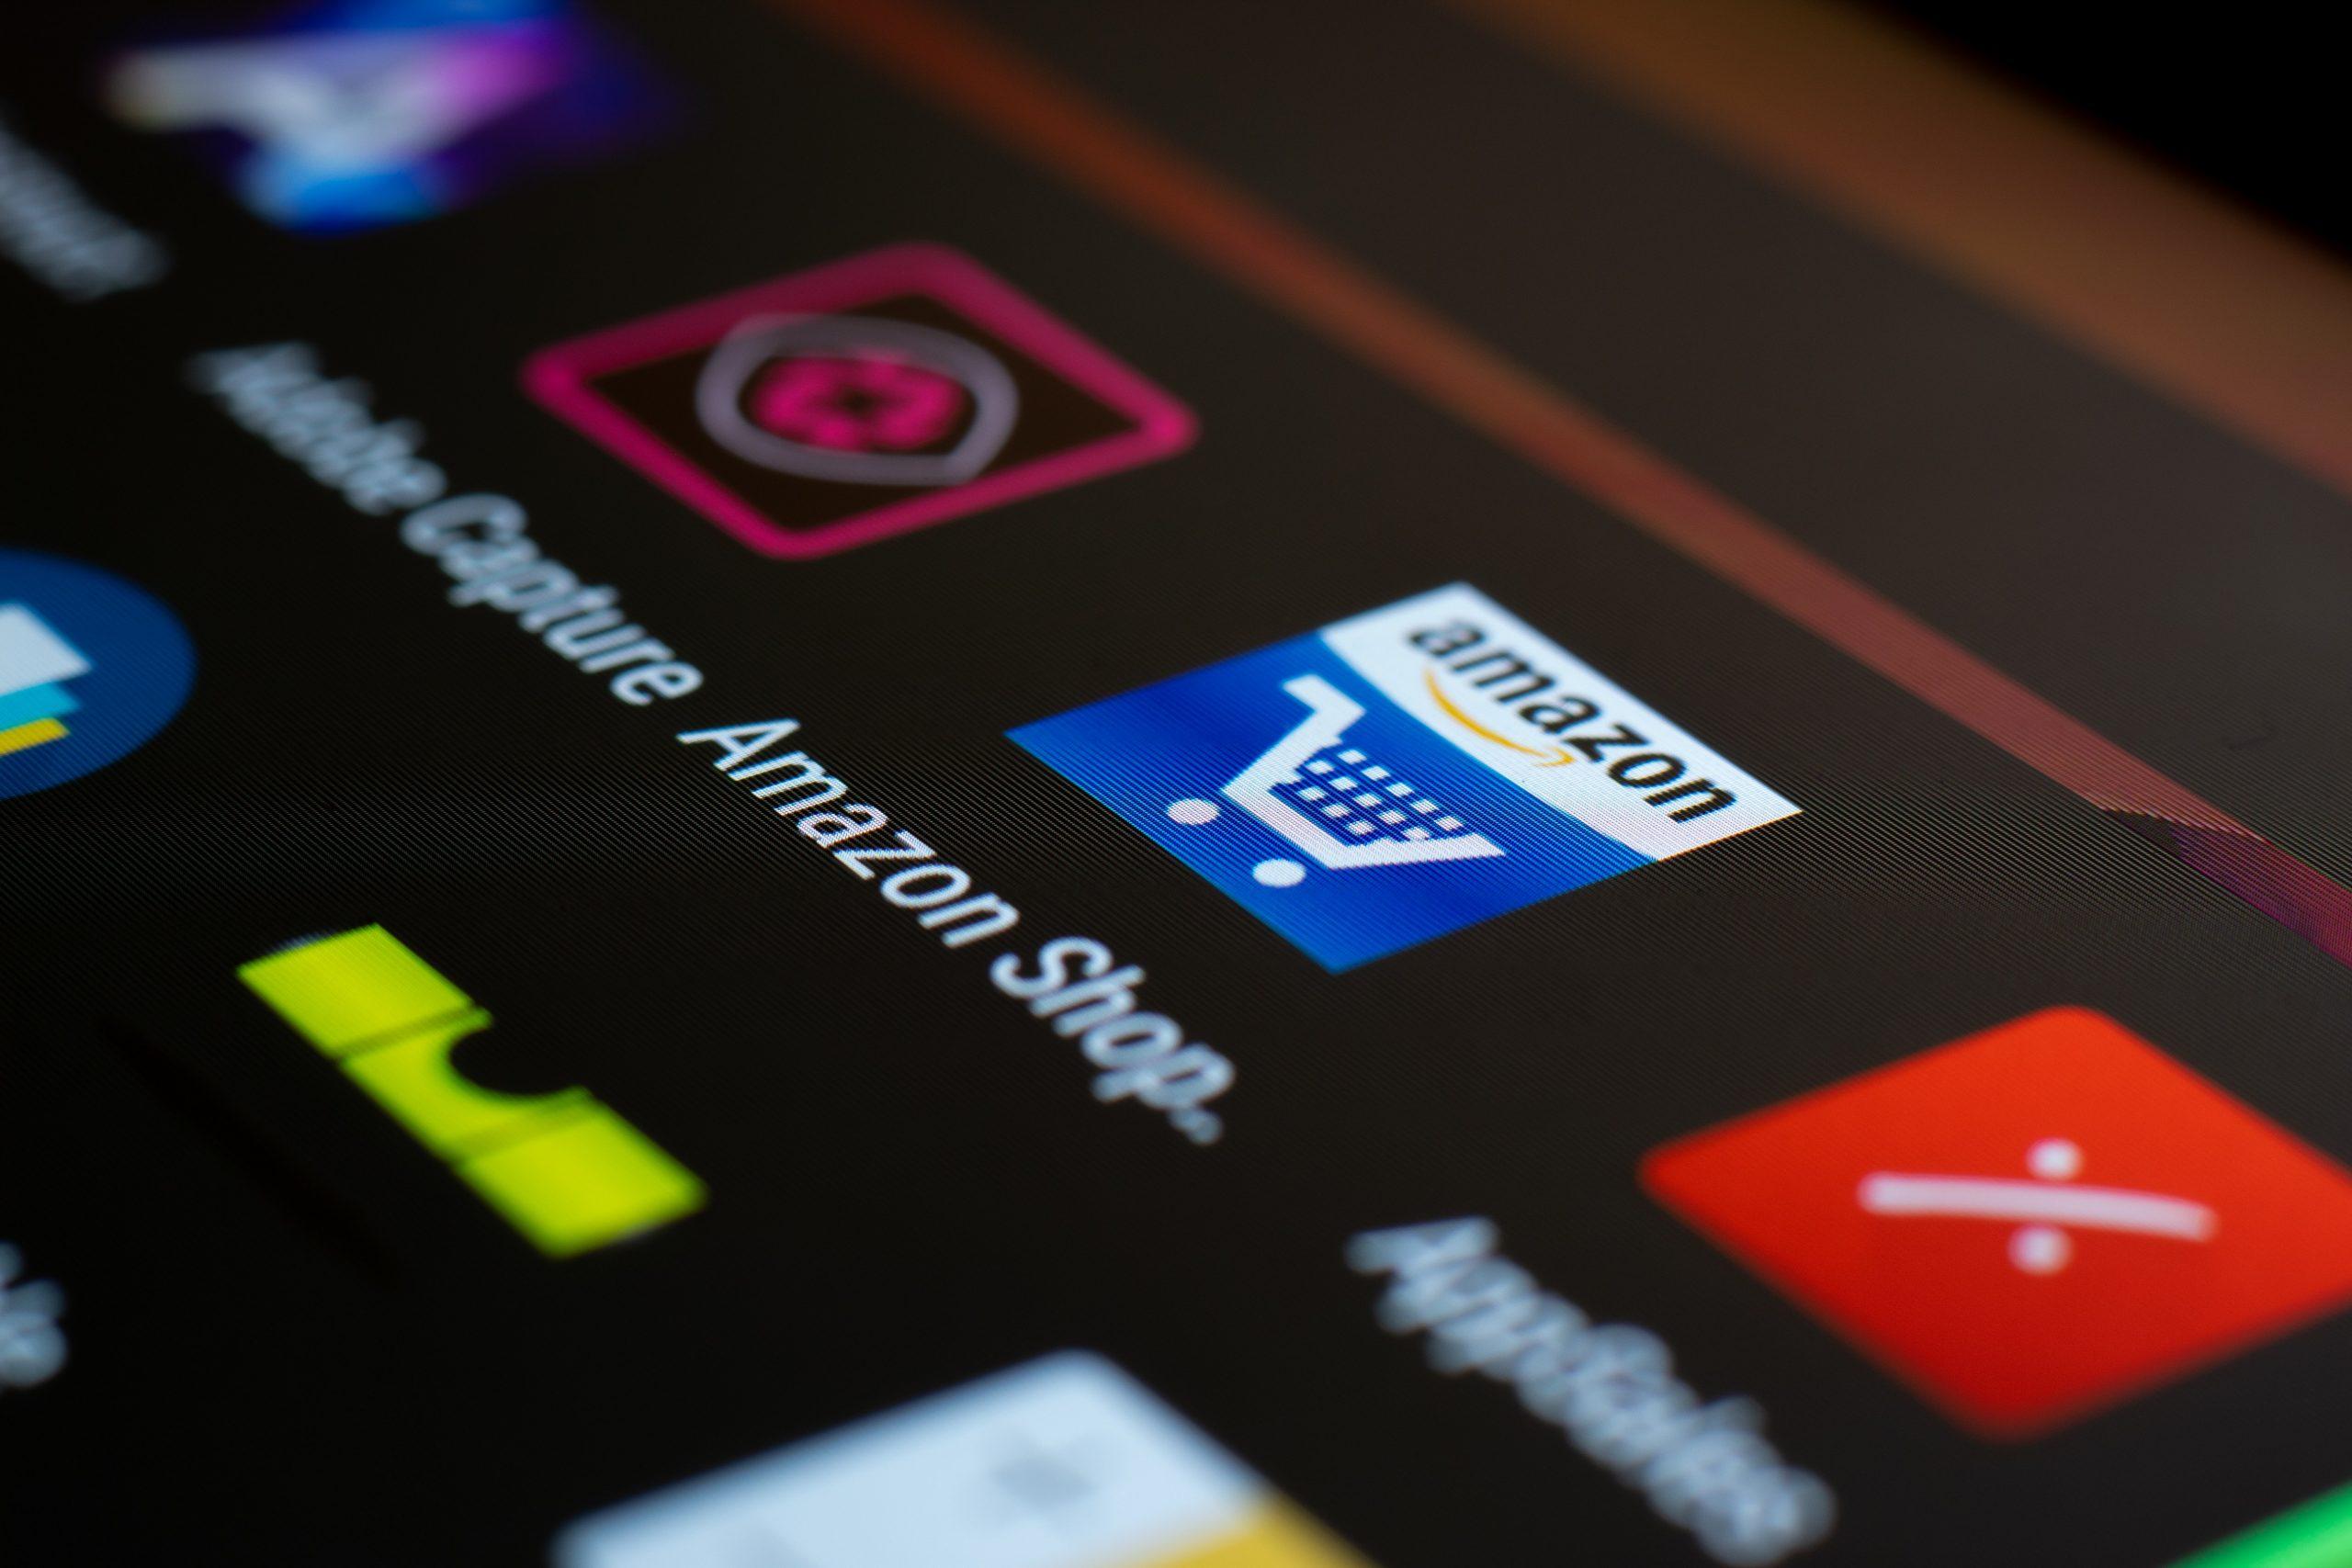 Over 10 billion Amazon counterfeit listings cracked down.